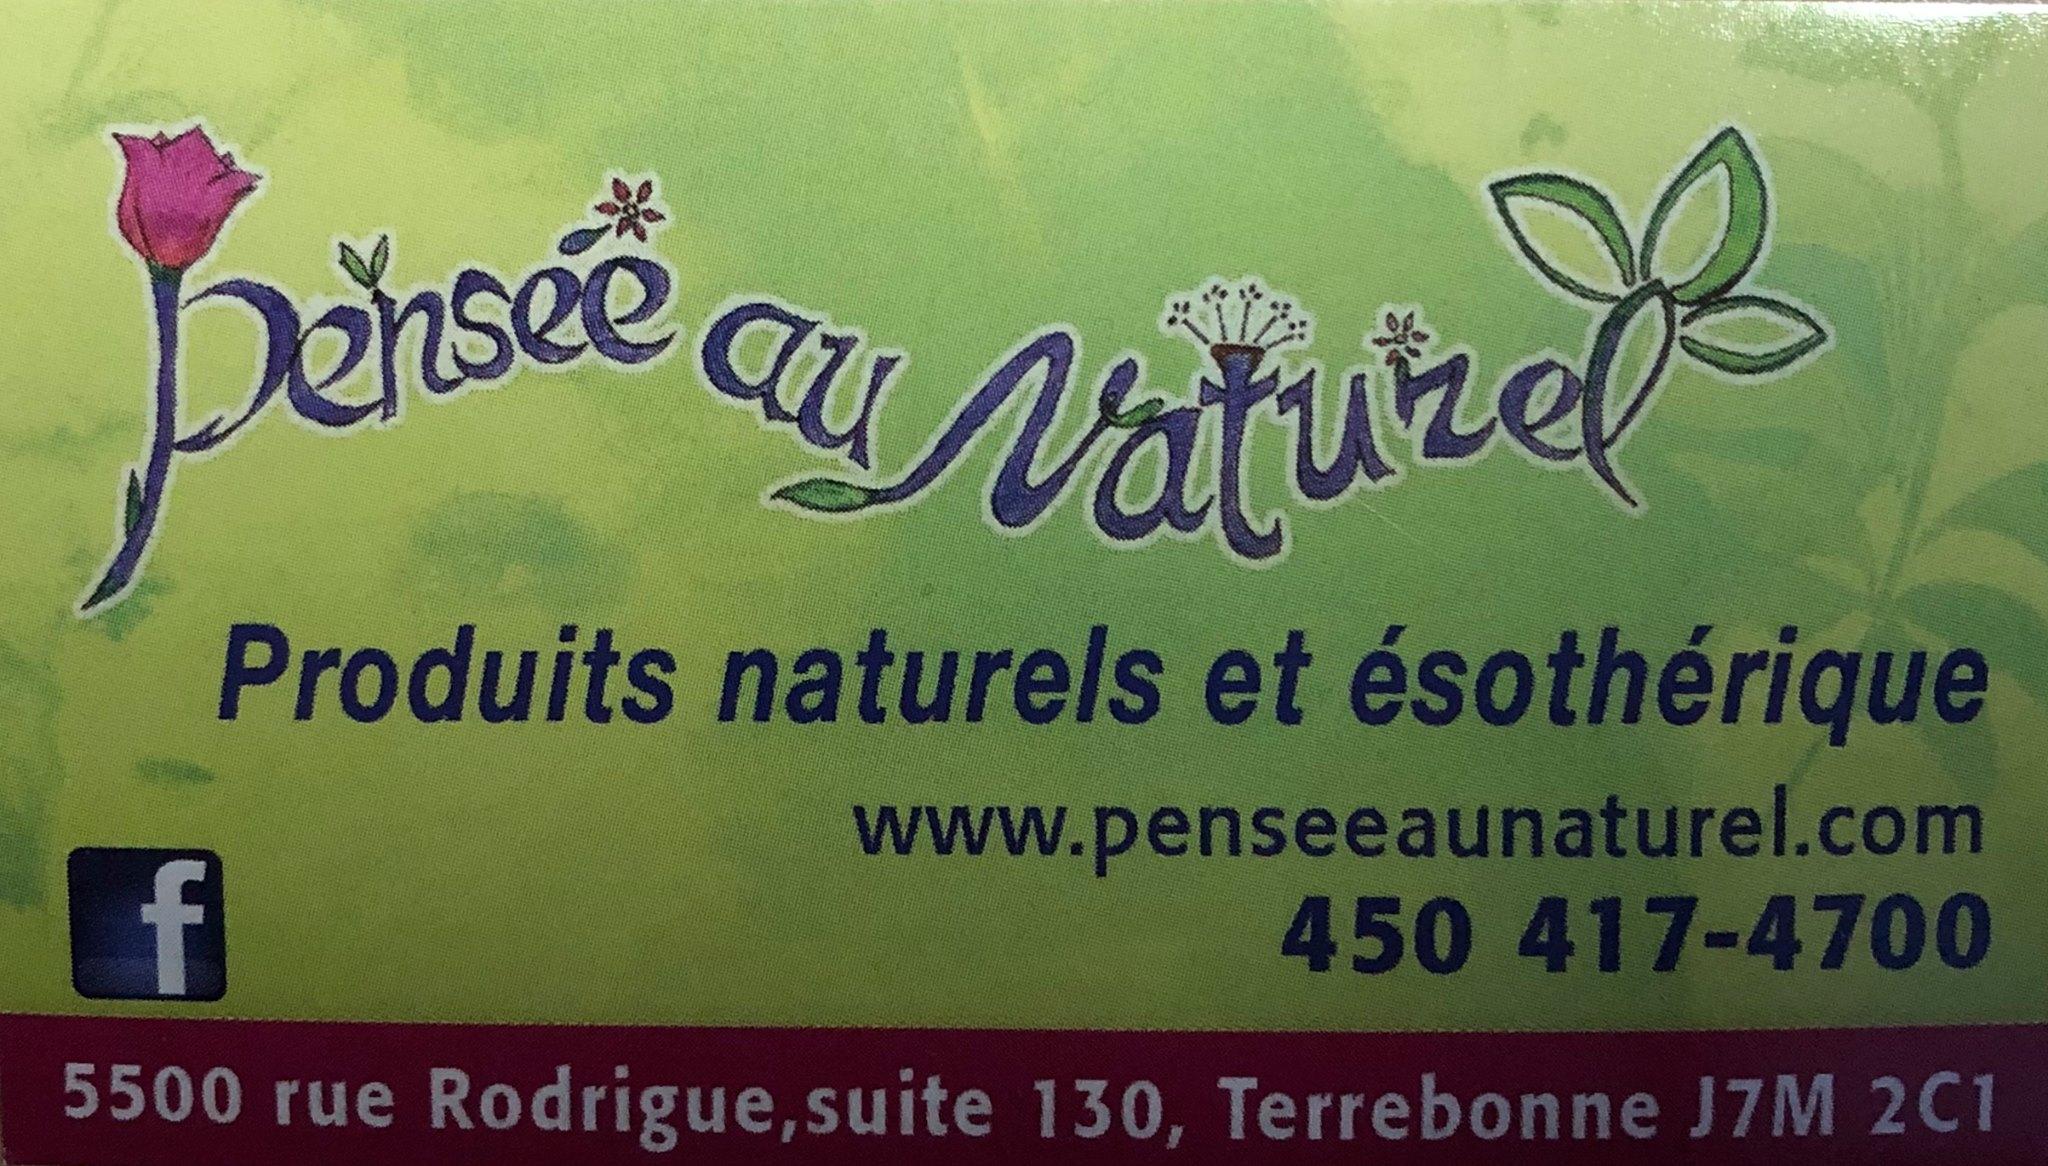 pensee au naturel